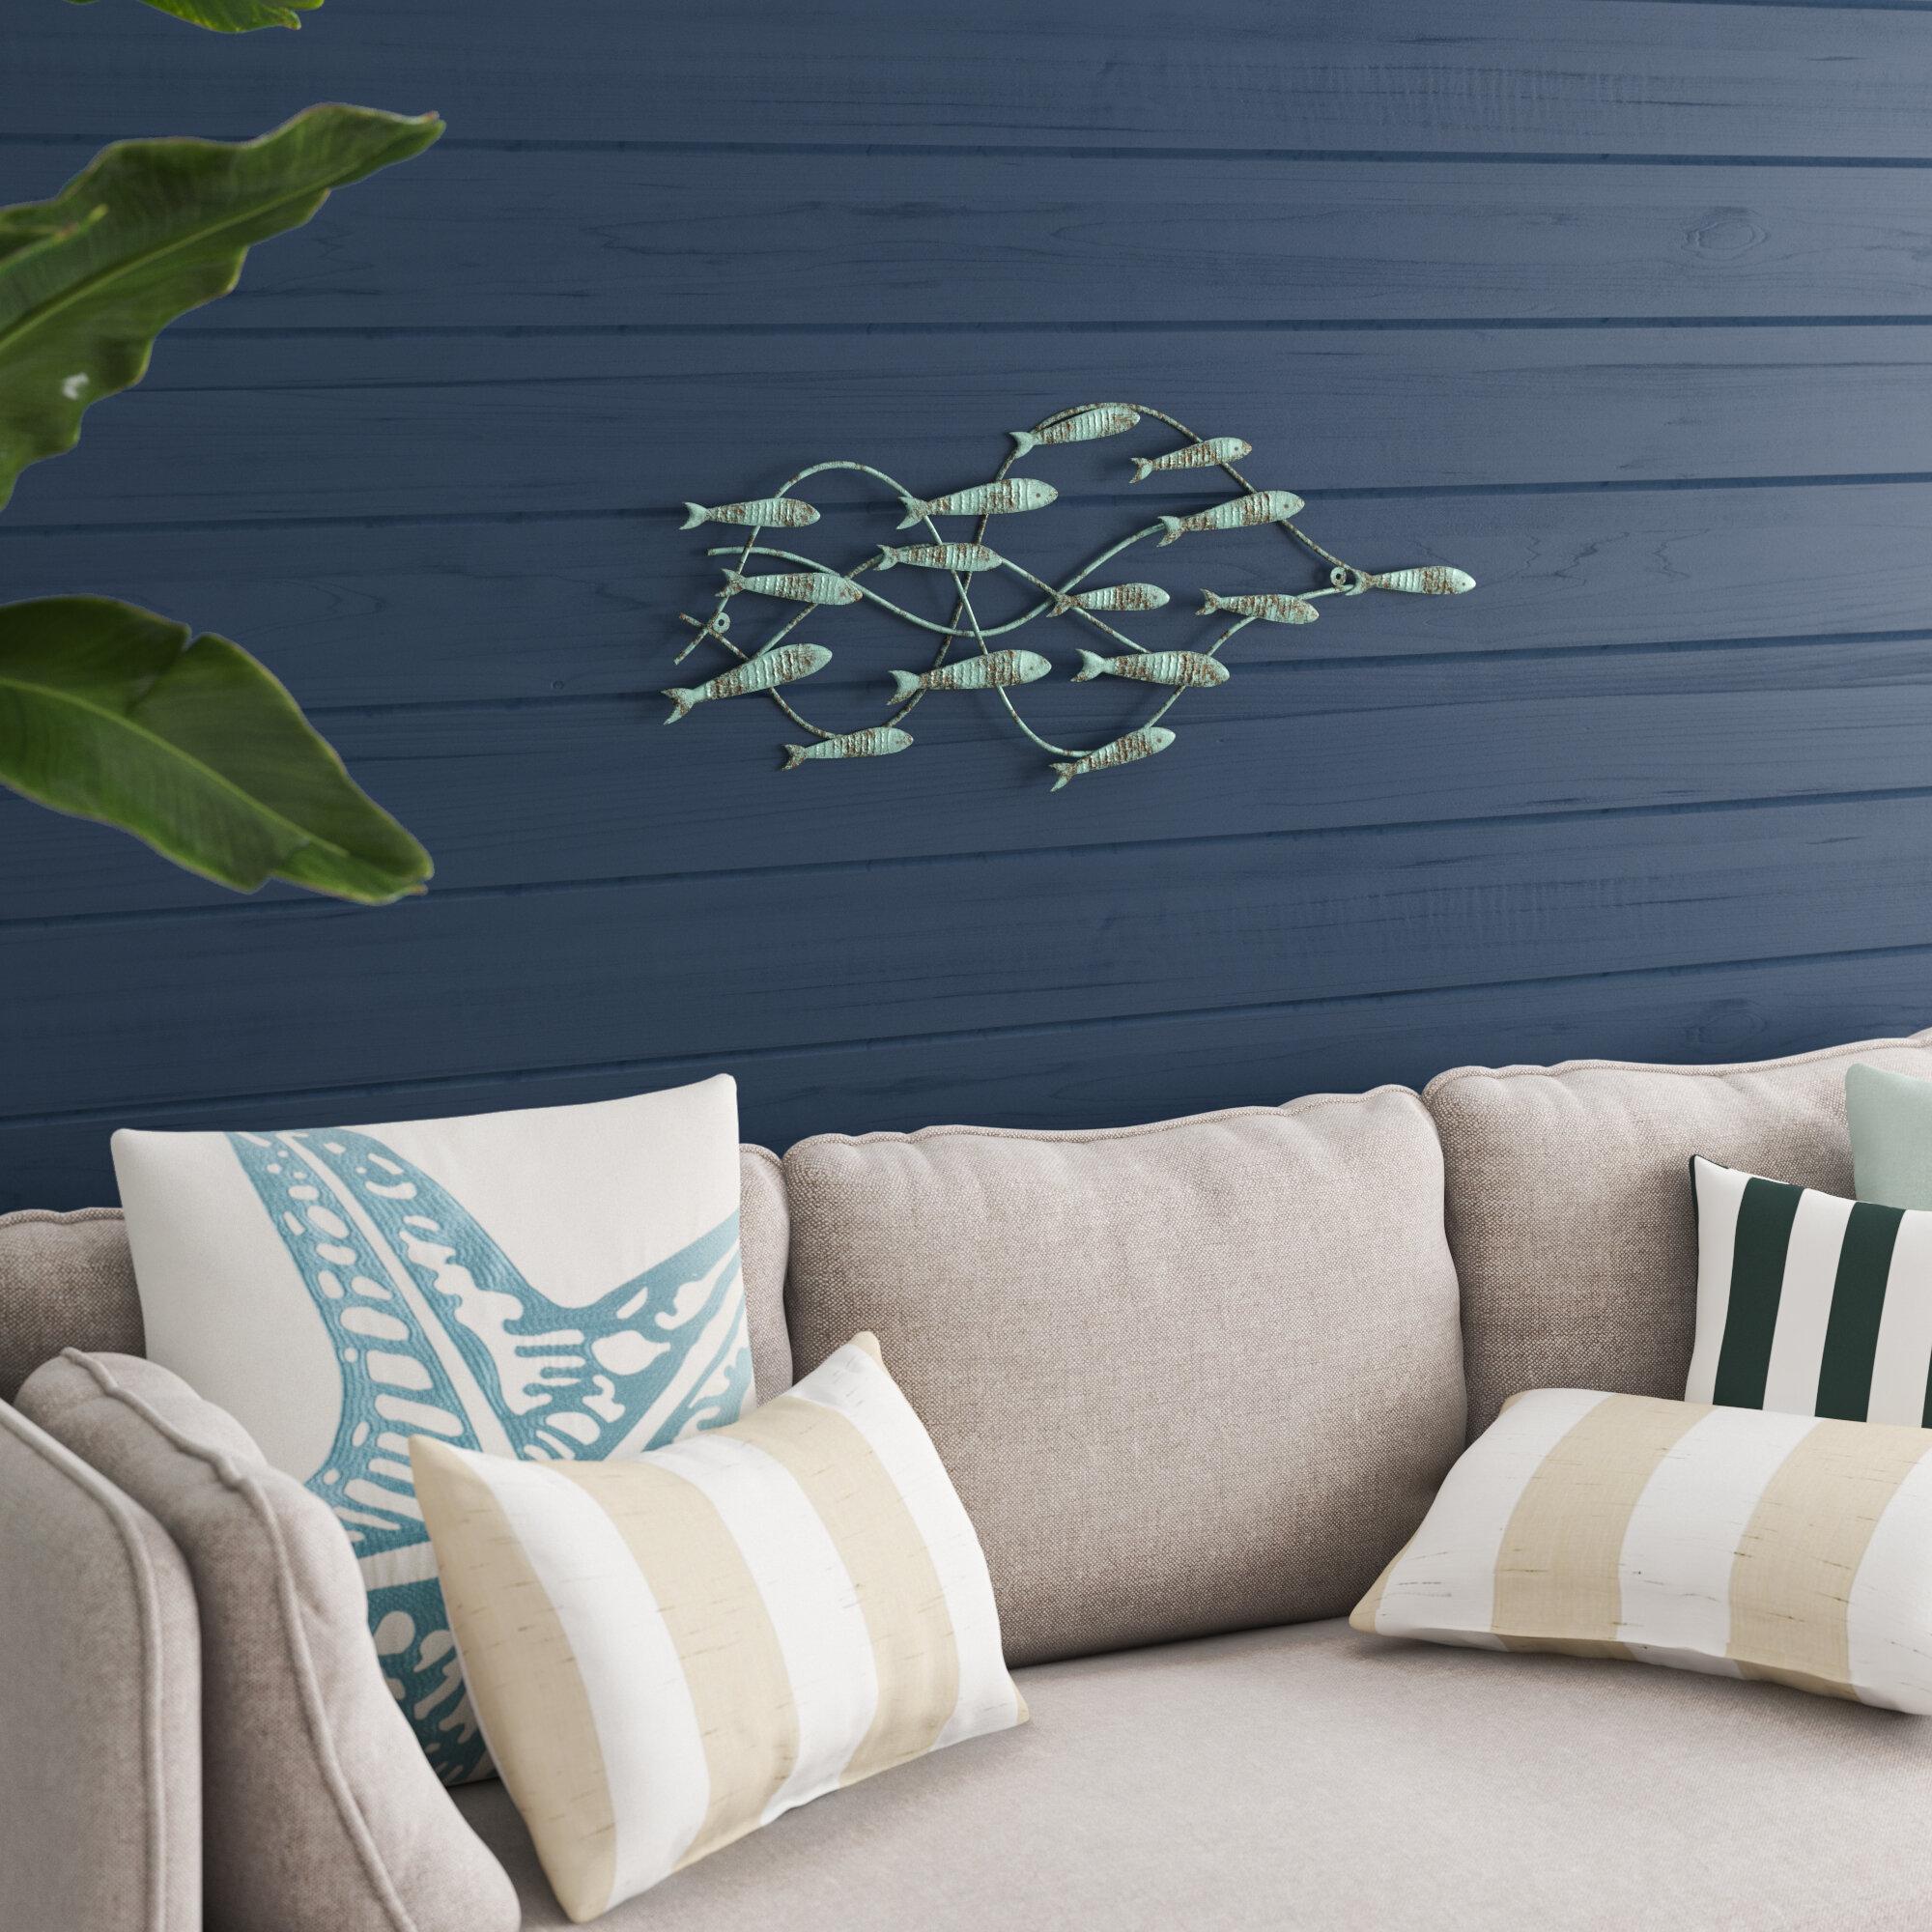 Decorative Distressed Iron School of Fish Widget Wall Decor